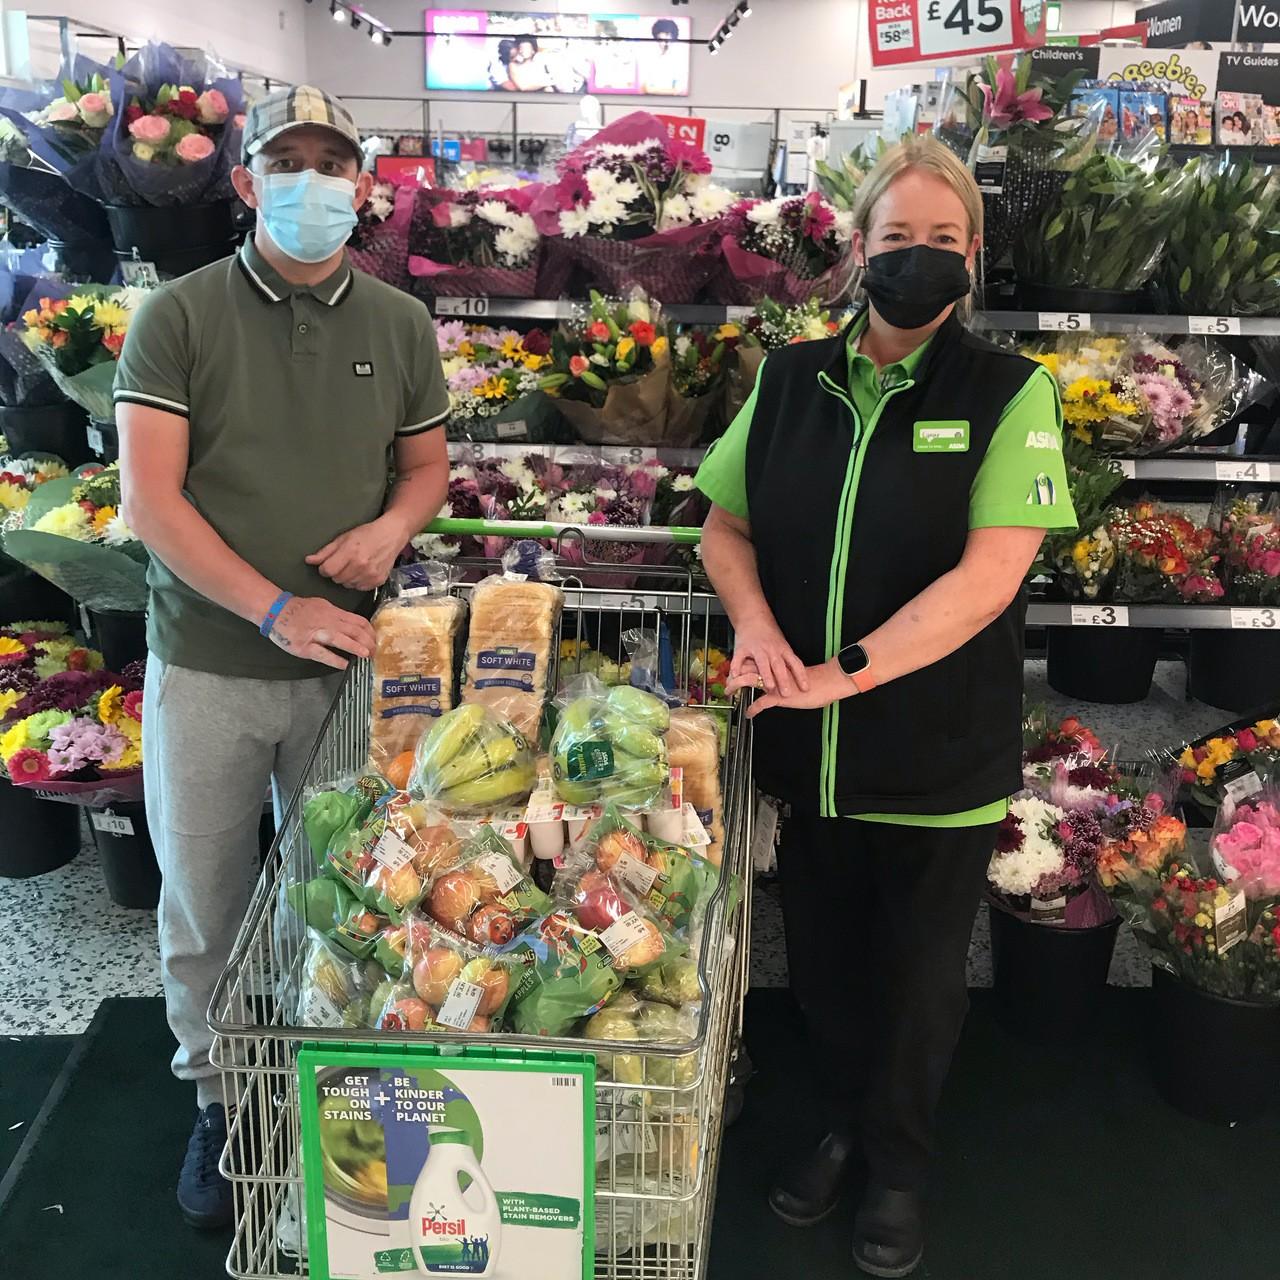 Helping the community | Asda Blackburn